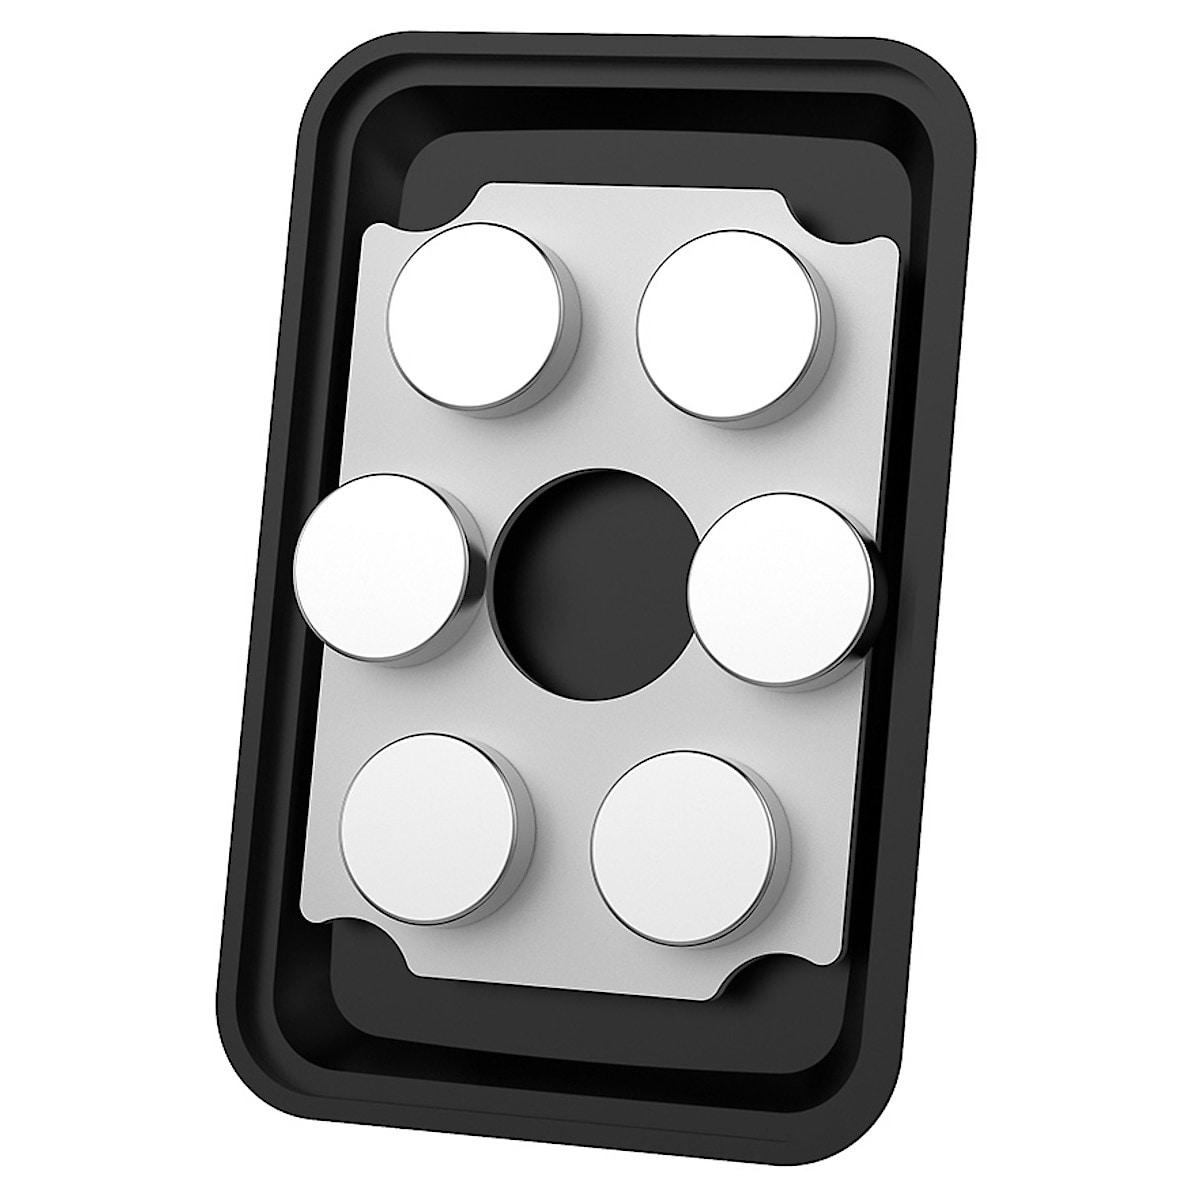 Celly Ghost Vent XL, mobilholder med magnet